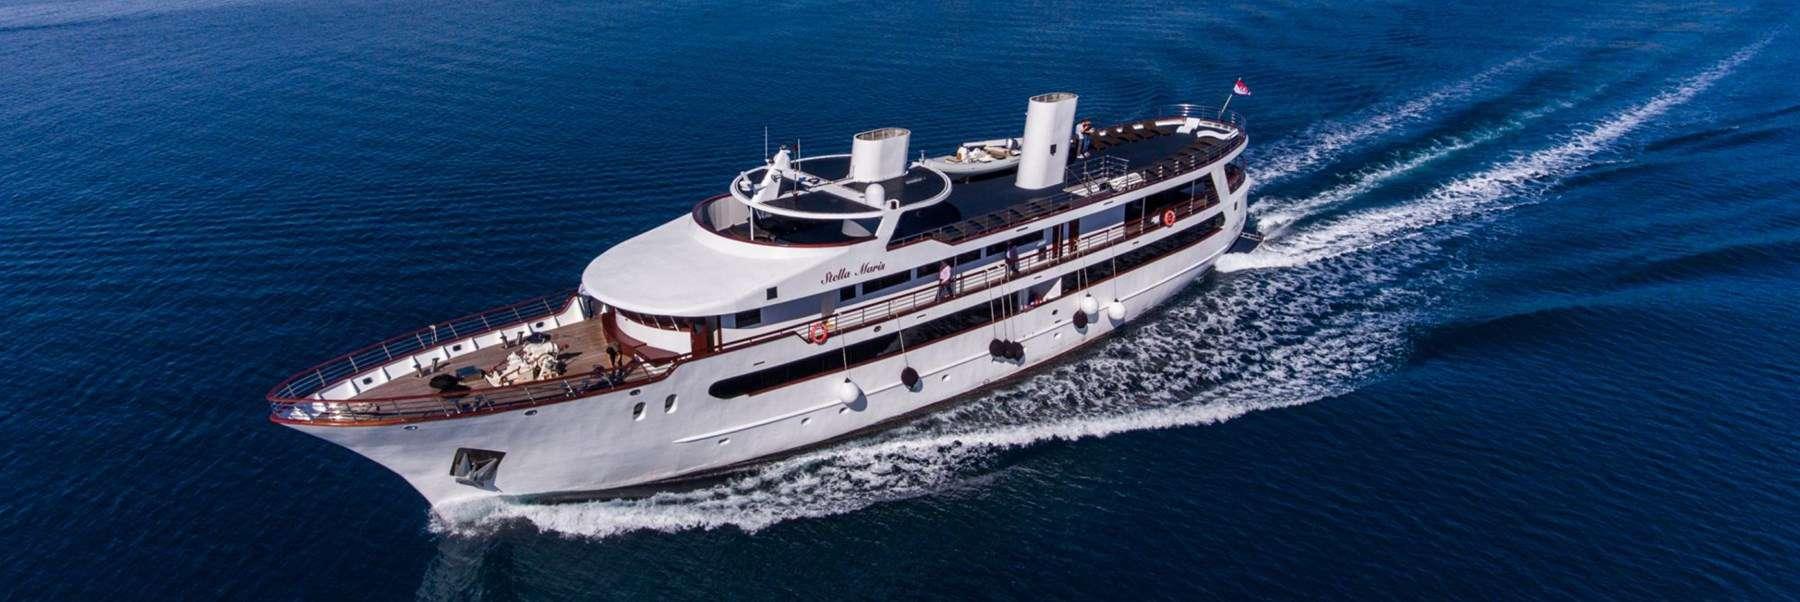 MS Stella Maris Cruise ship, Croatia